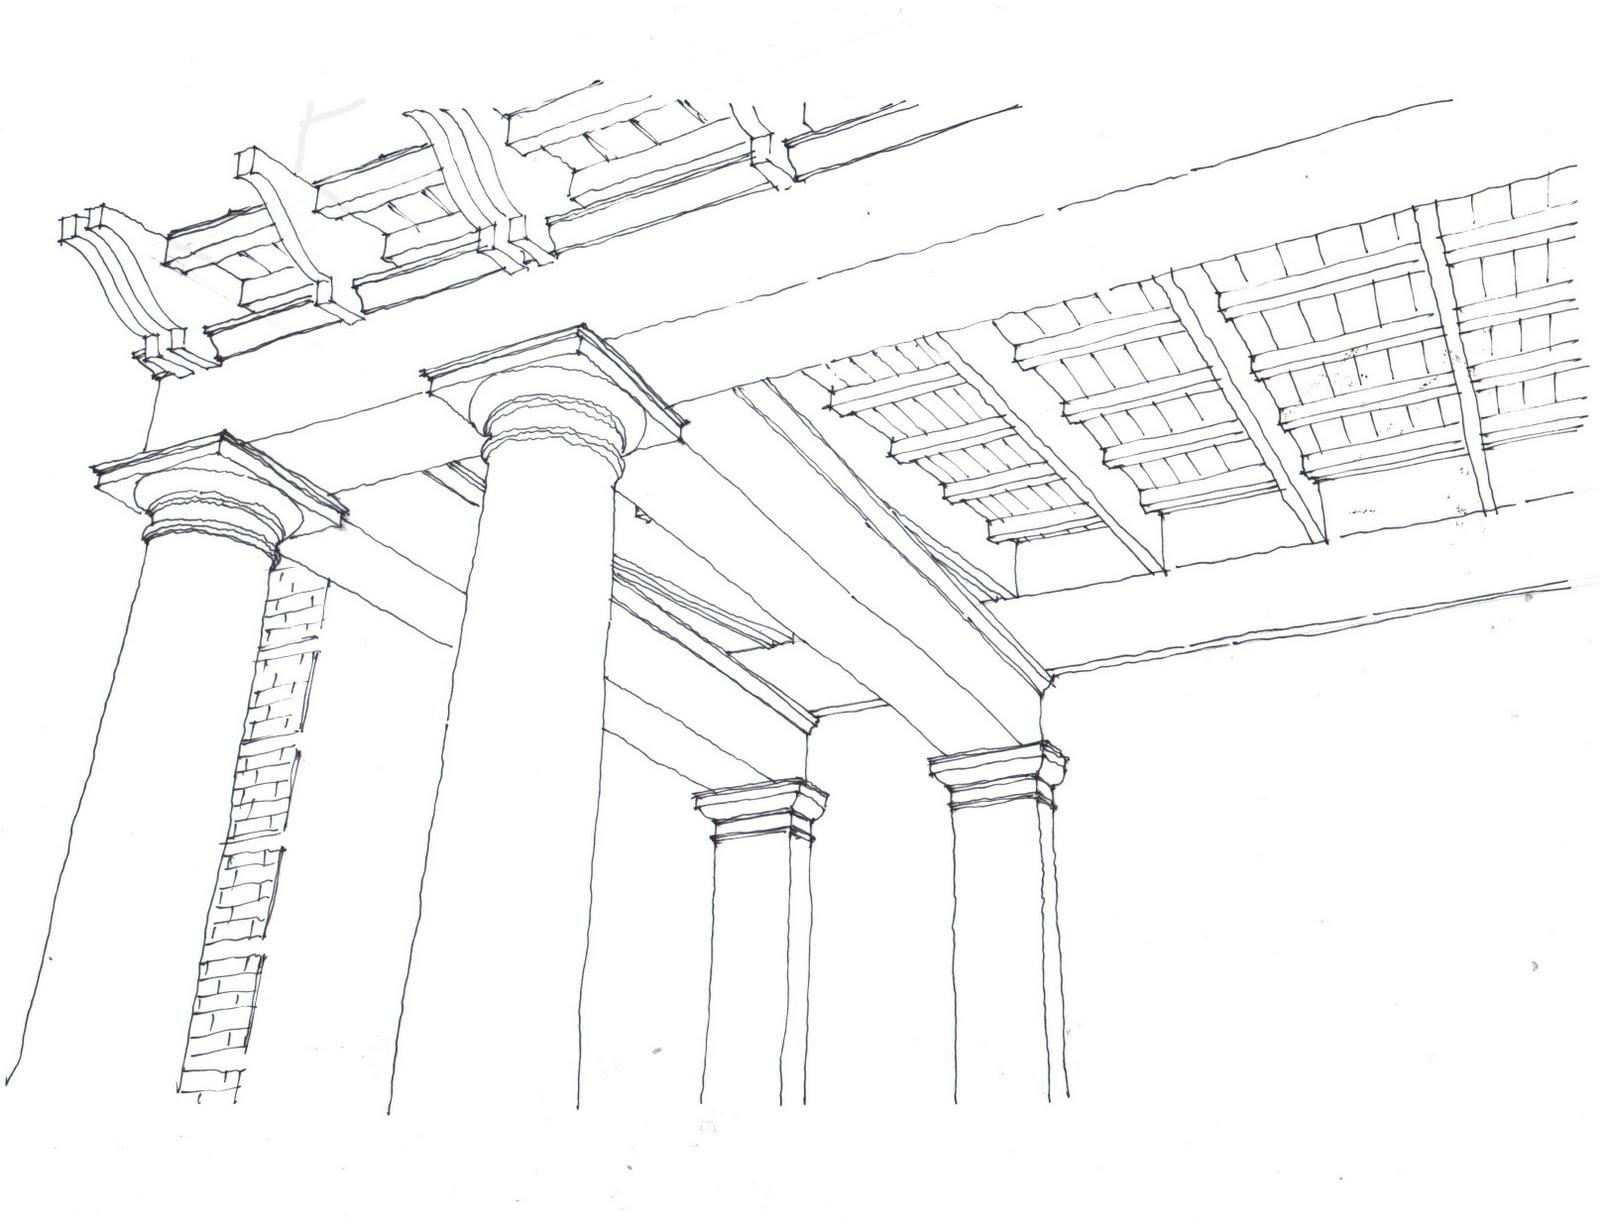 in defense of drawing dear polia ink on vellum nadia palacios lauterbach